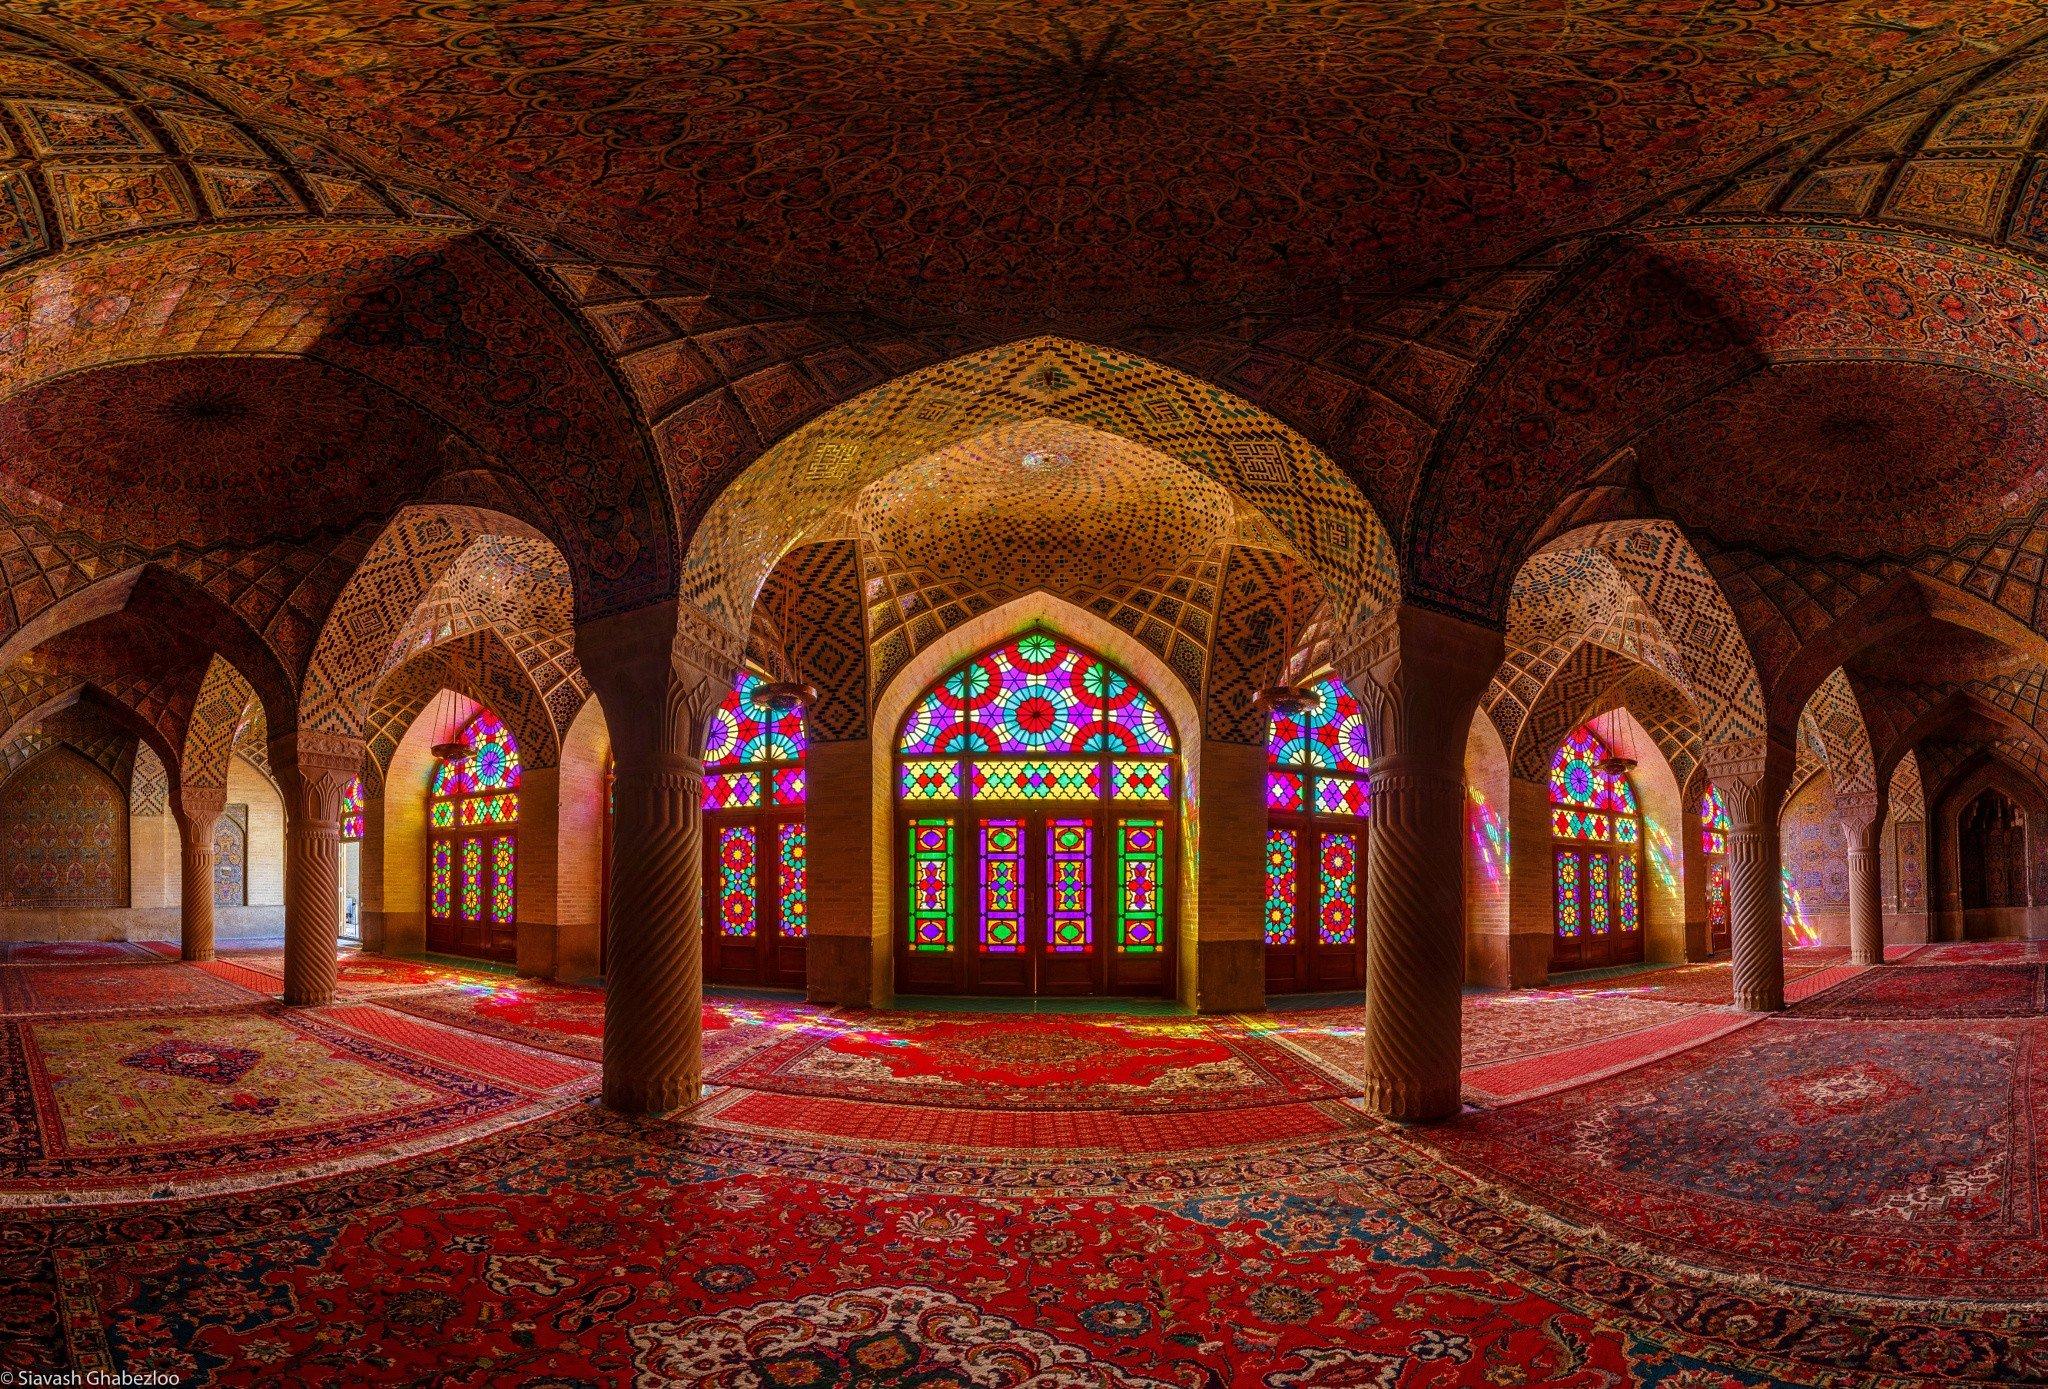 muslim art and architecture - HD1920×1284